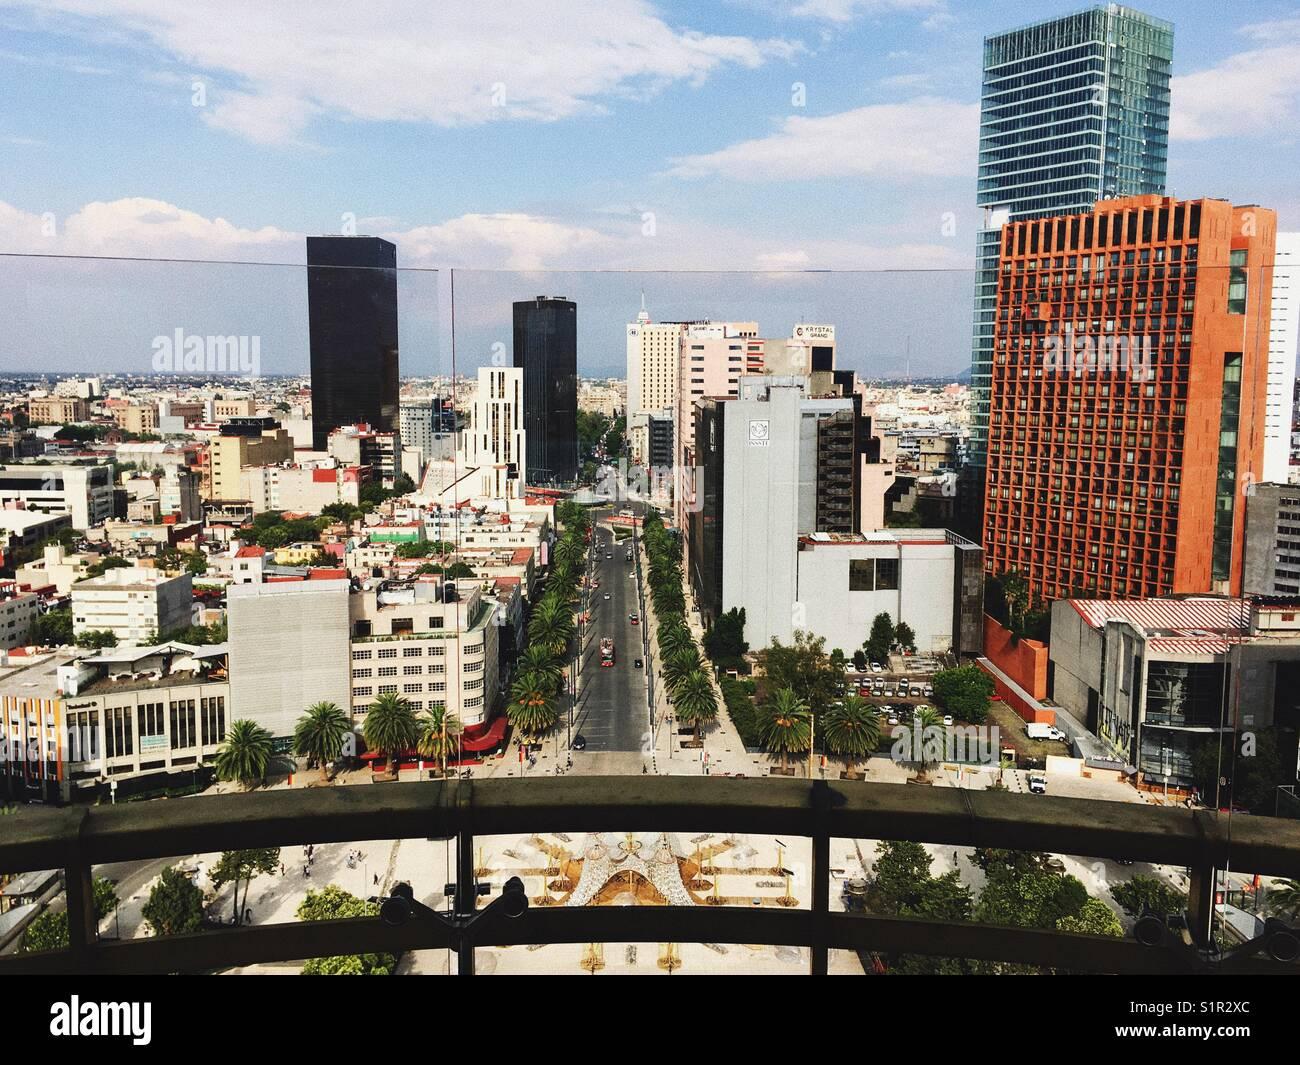 Mexico City skyline - Stock Image